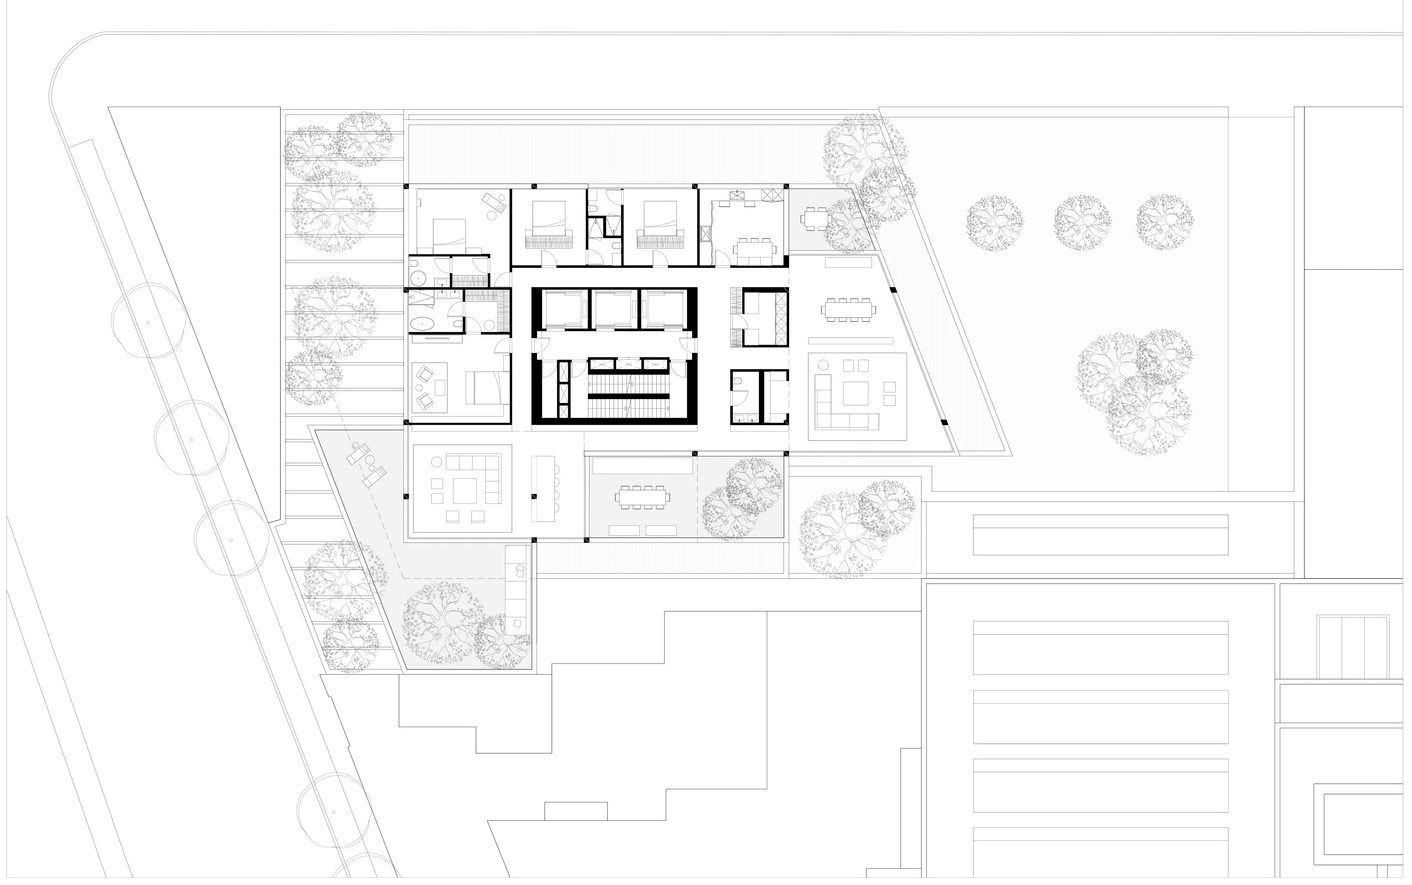 studio-seilern-architects-chelsea-tower-7